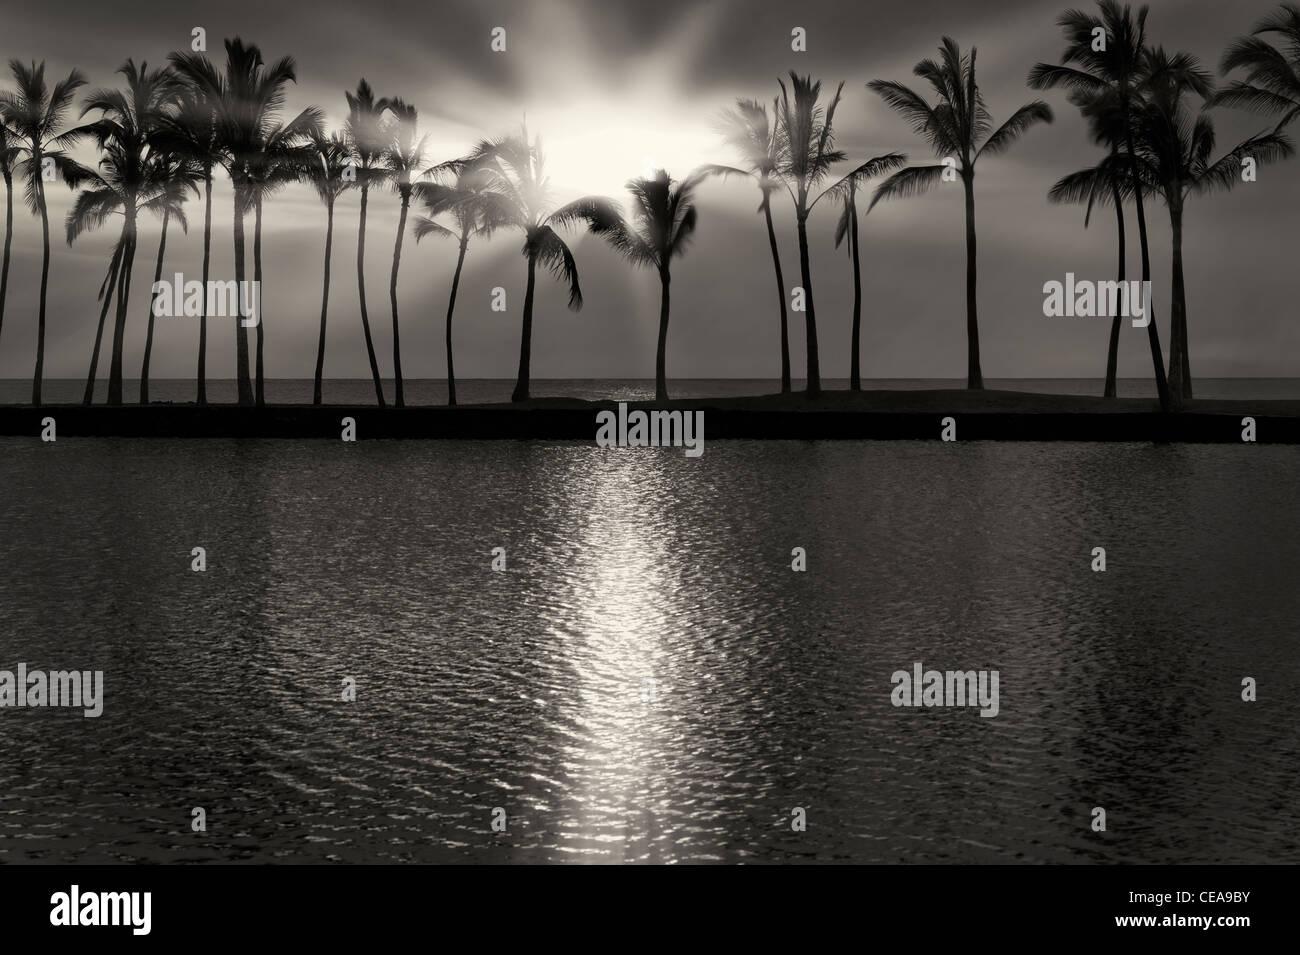 Palm trees and sunset. Hawaii, The Big Island - Stock Image